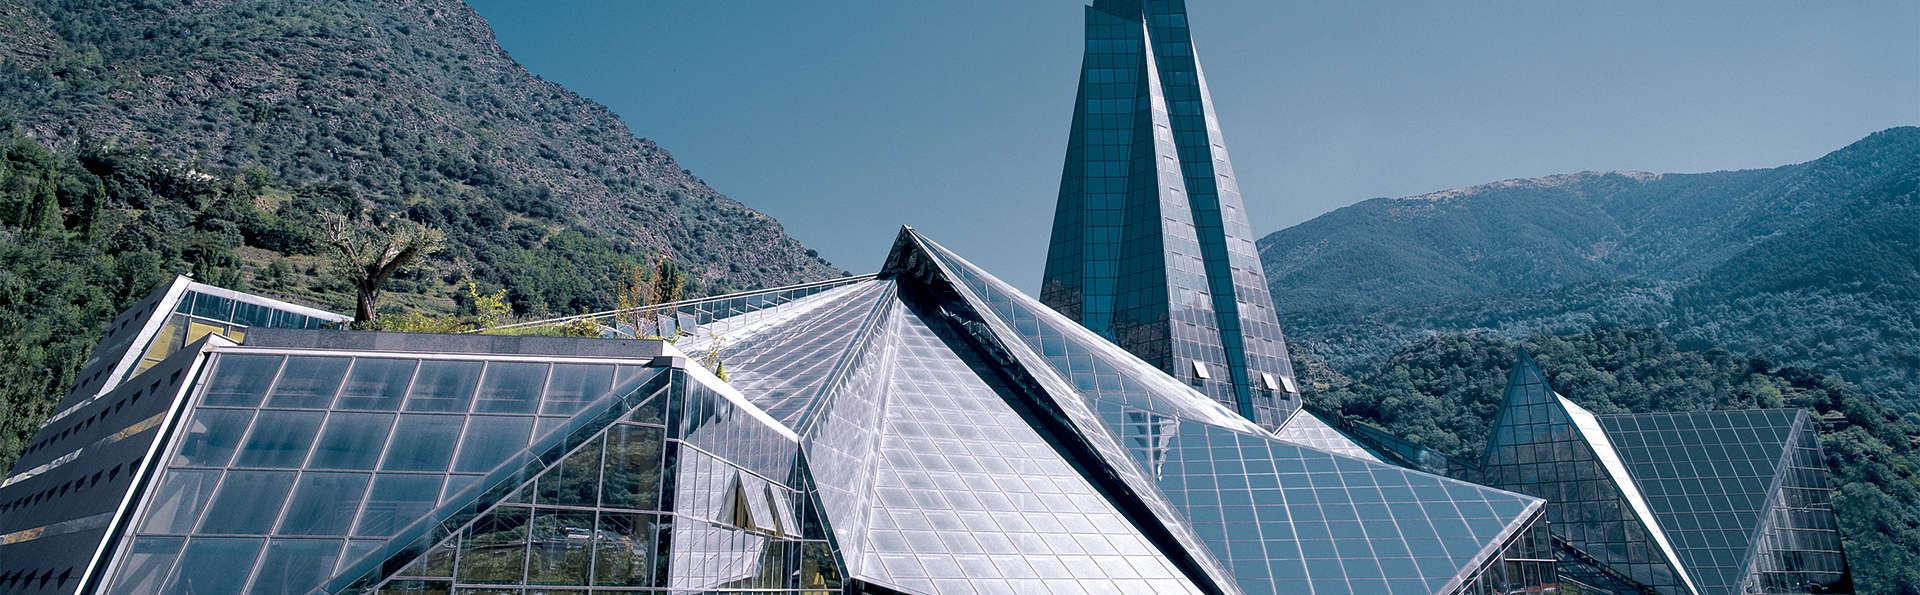 Novotel Andorra - edit_caldea.jpg